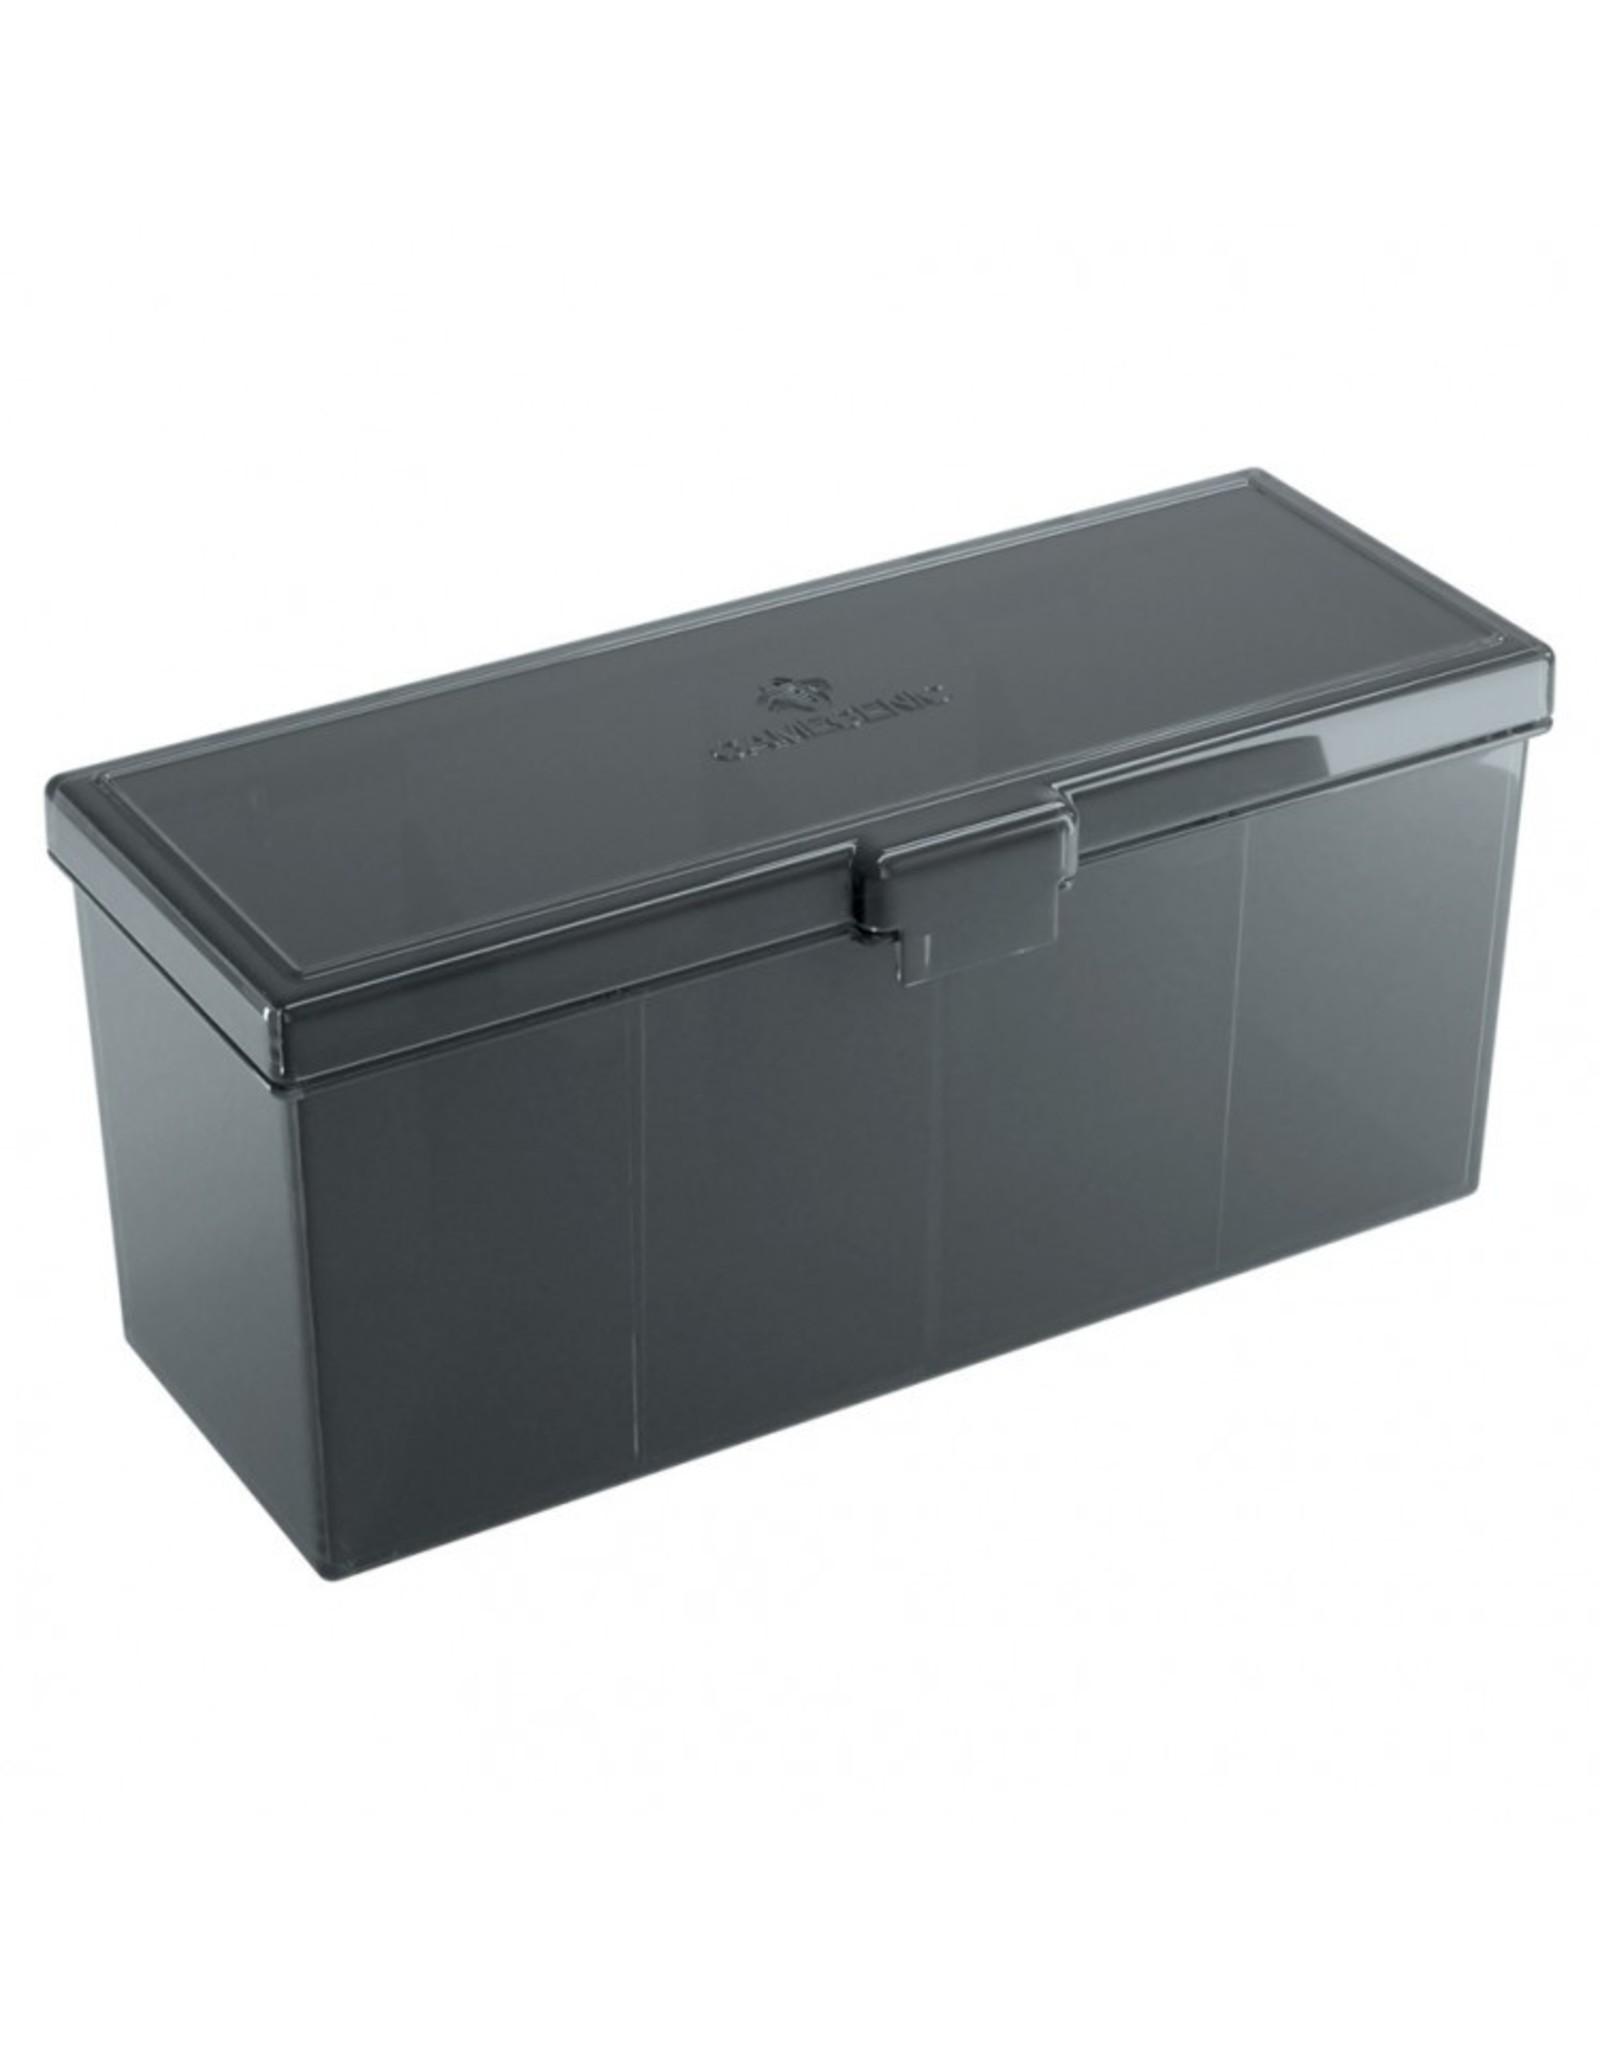 GameGenic Deck Box: Fourtress 320+ BK